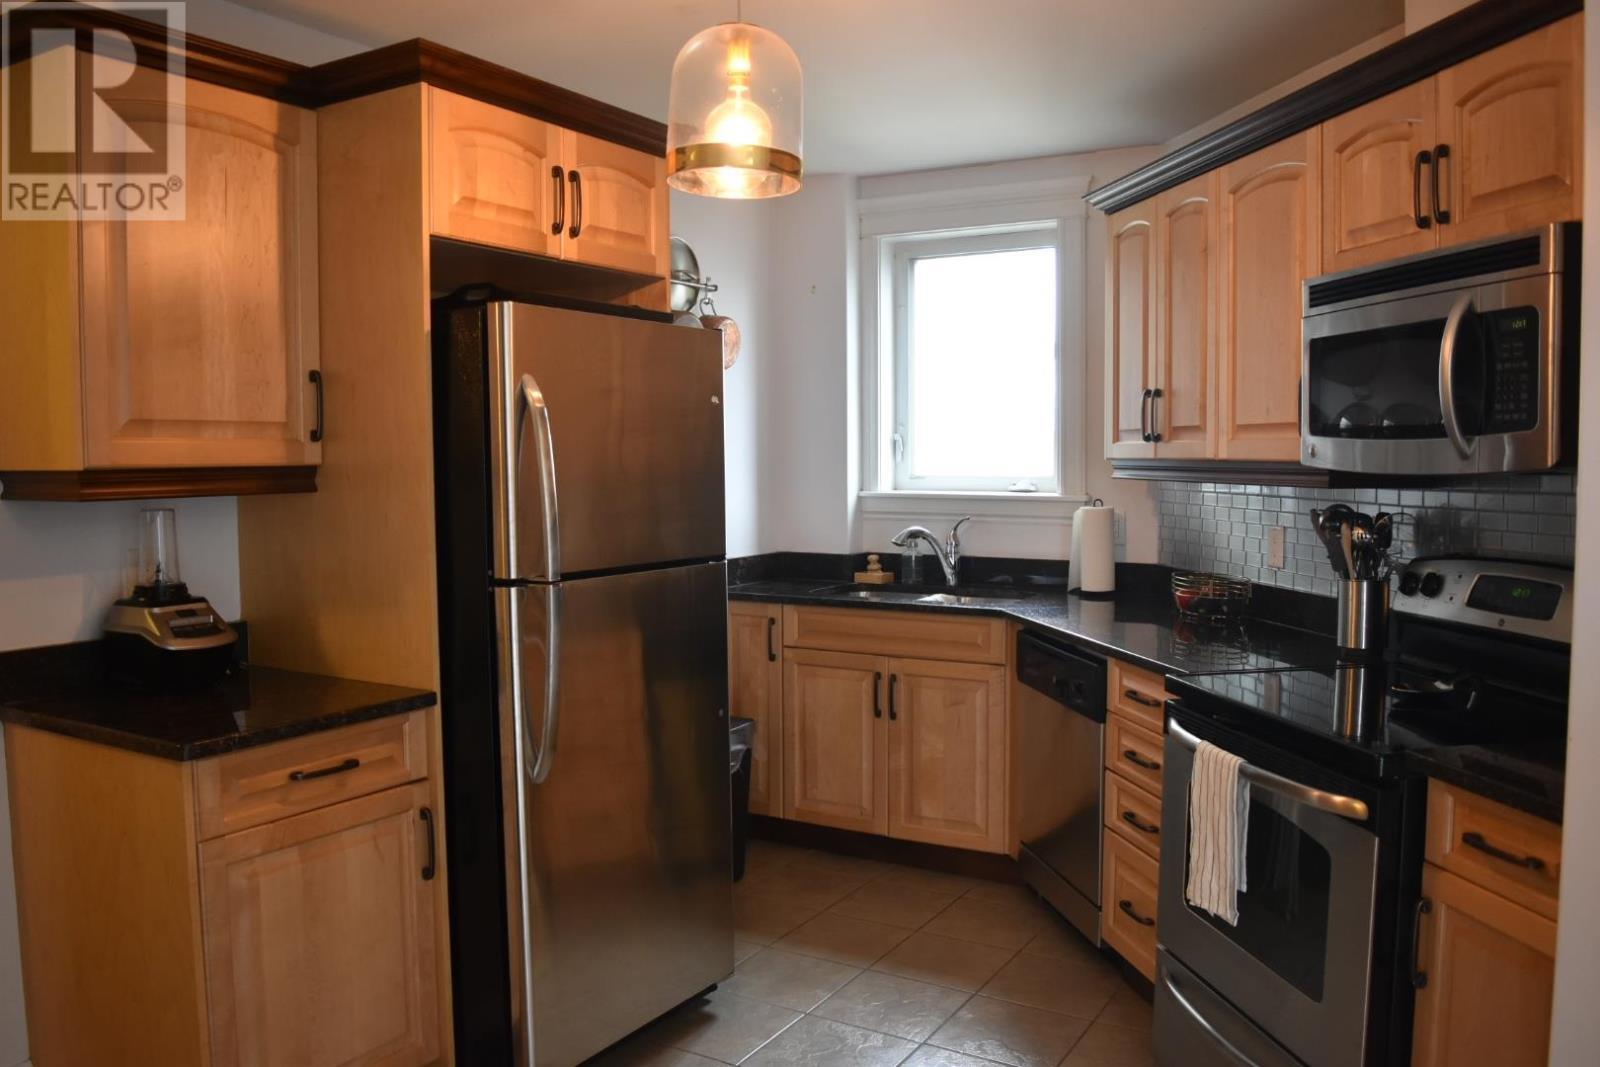 304 5689 Cunard Street, Halifax, Nova Scotia  B3K 1C7 - Photo 1 - 202118347